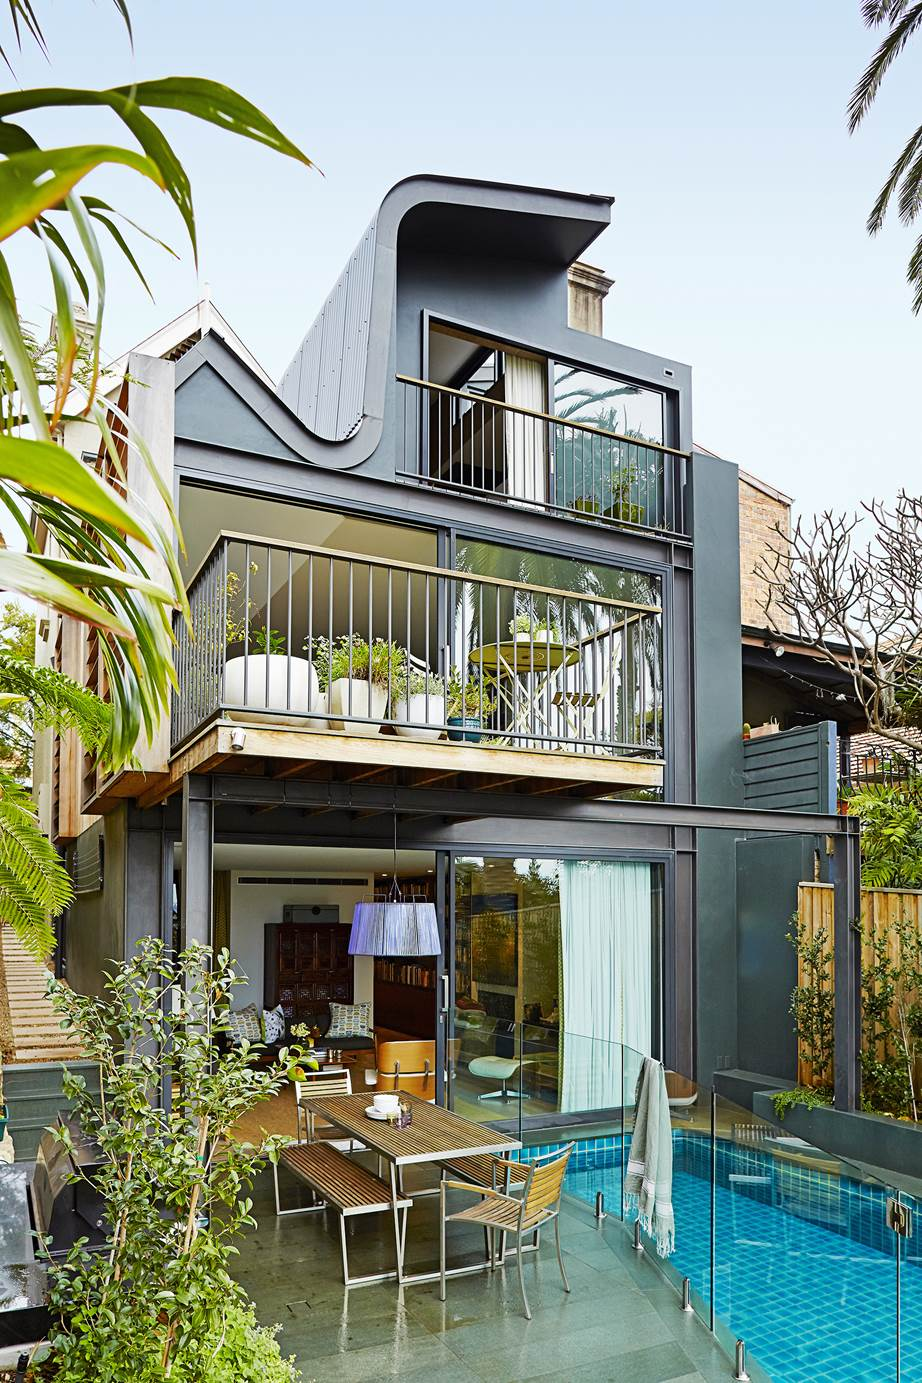 Birchgrove Terrace by Daniel Boddam